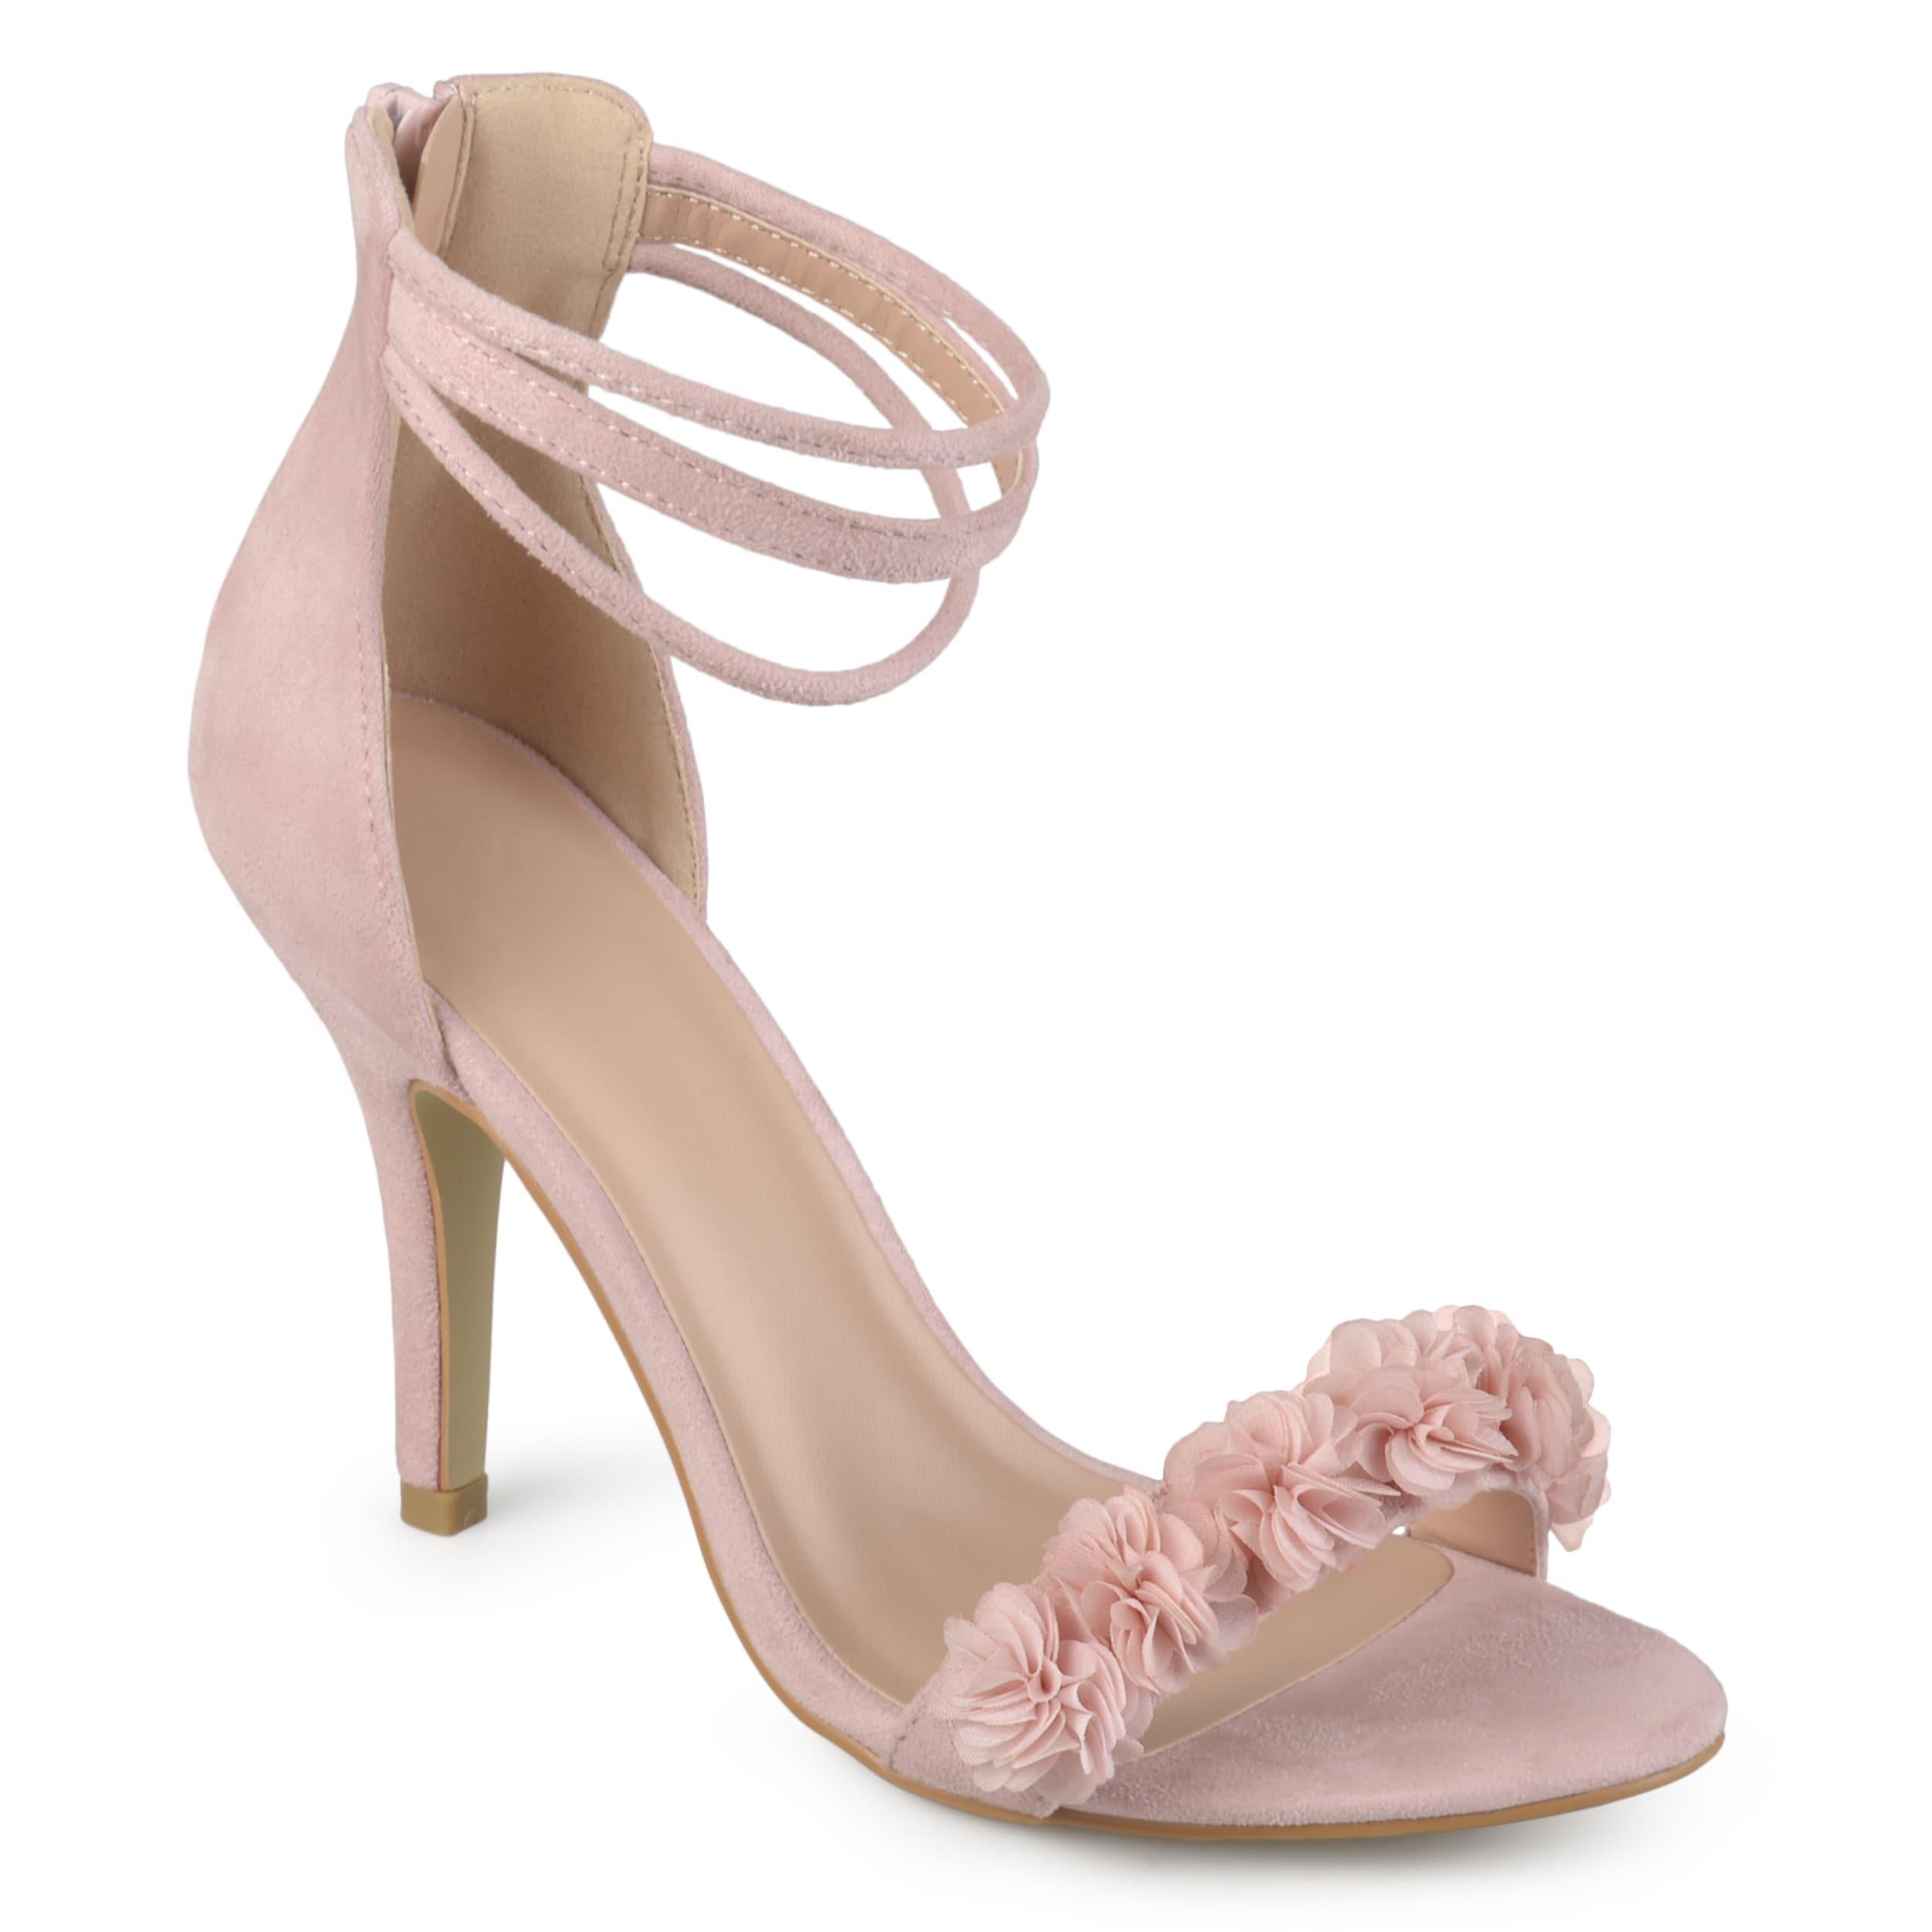 Buy Pink Medium Womens Heels Online At Overstock Our Best